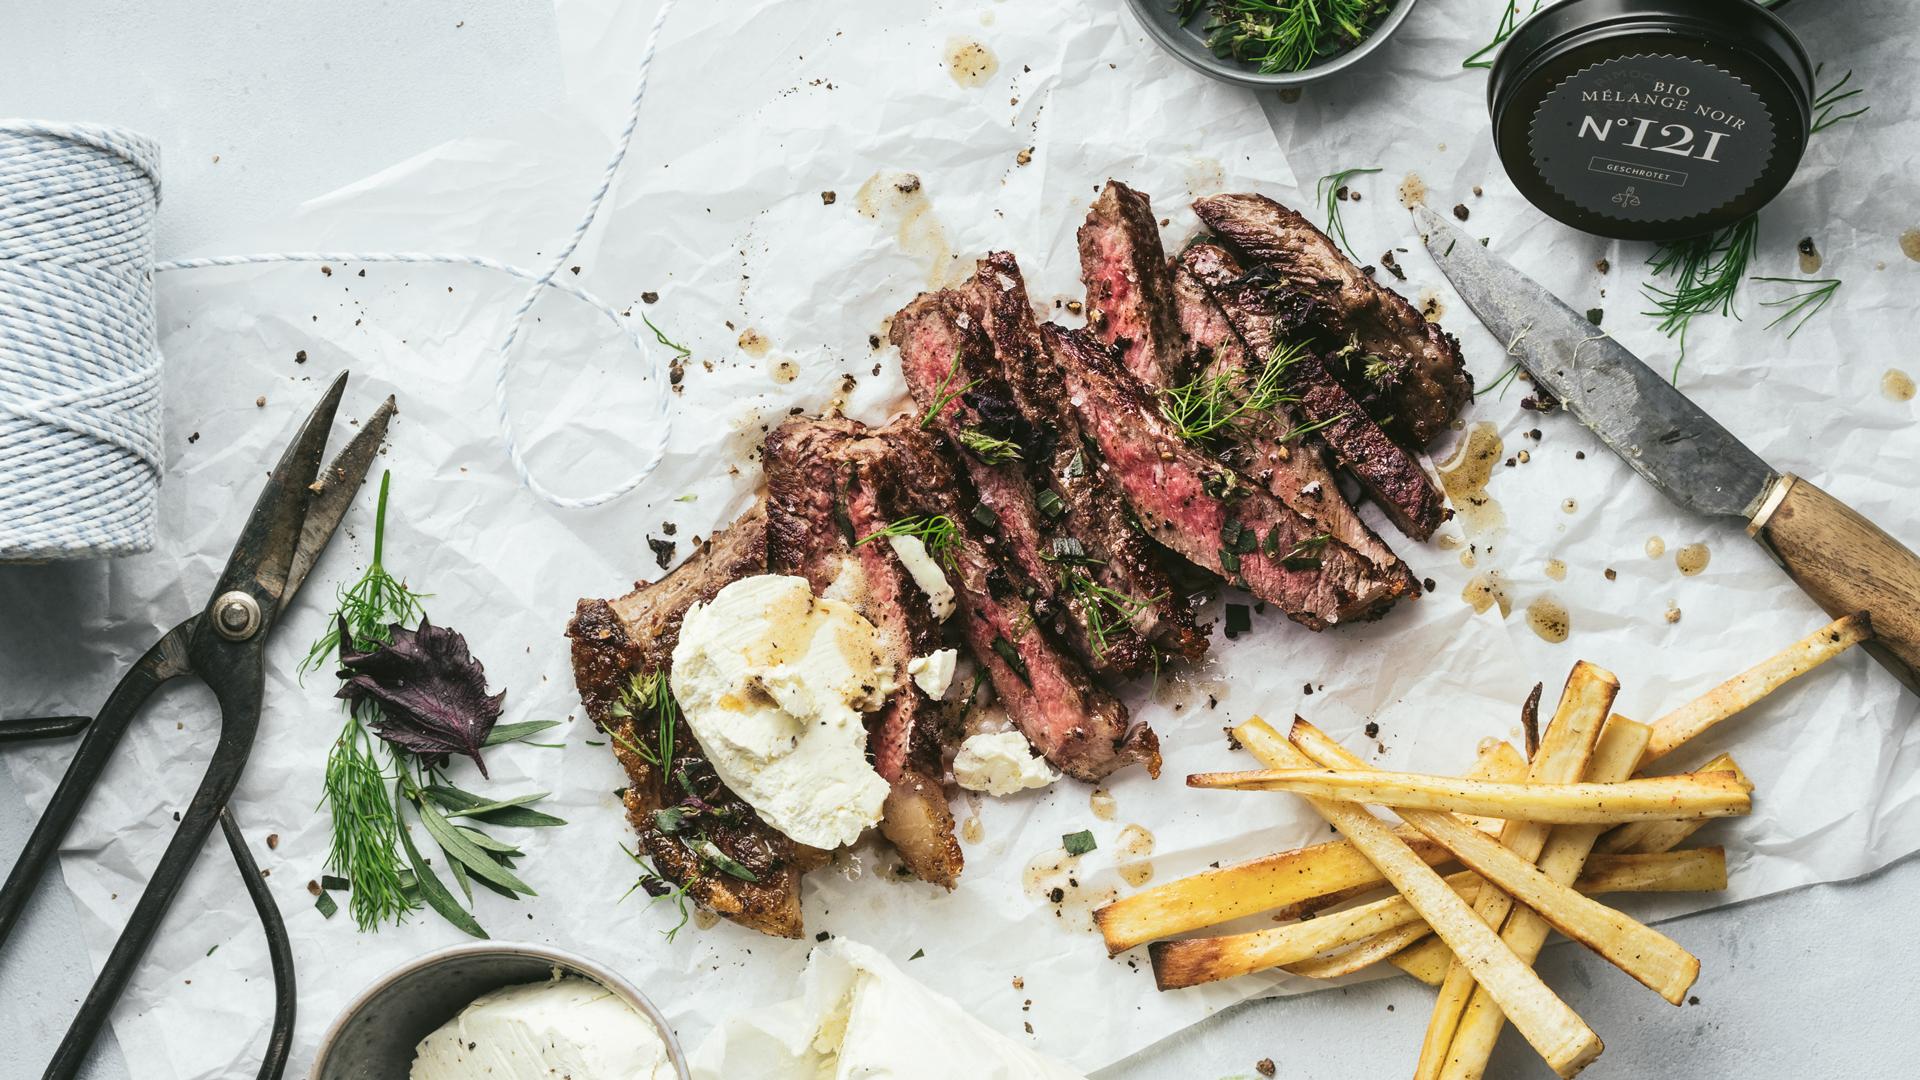 steak-pfeffer-ingwer-butter-melange-noir-cuddling-carrots-rimoco16x9